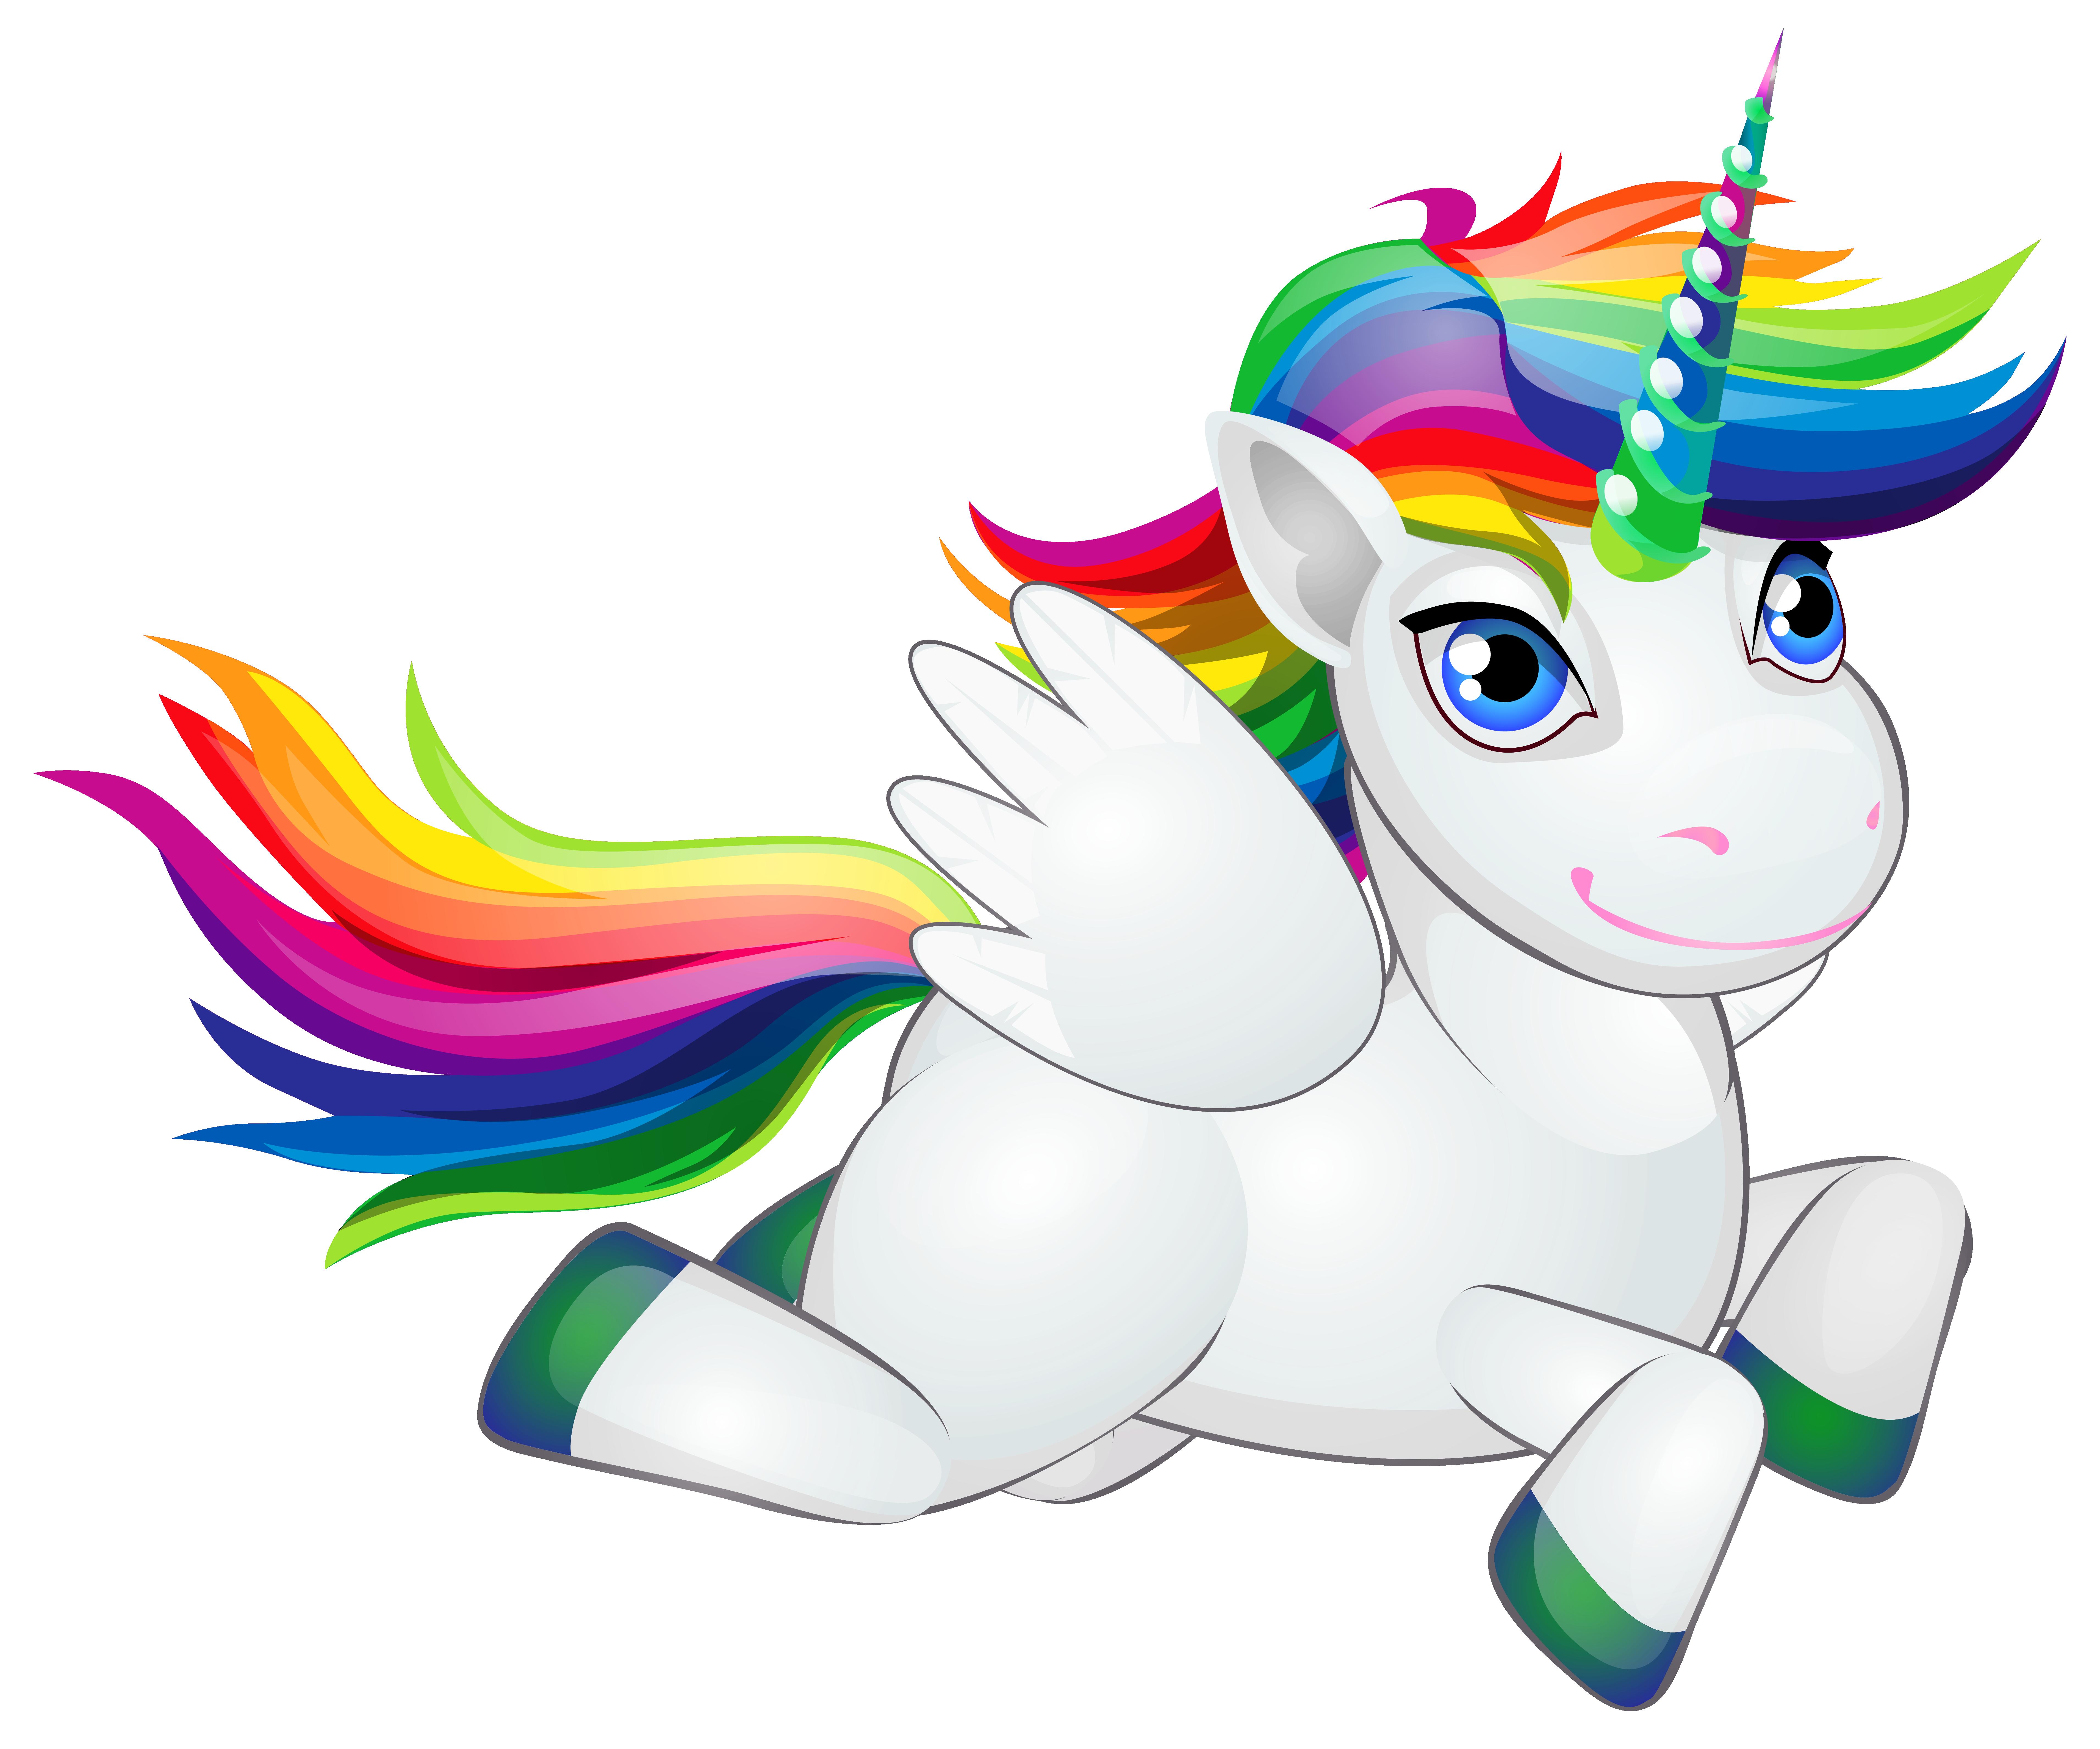 7642x6363 Cute Rainbow Pony Png Clip Art Imageu200b Gallery Yopriceville